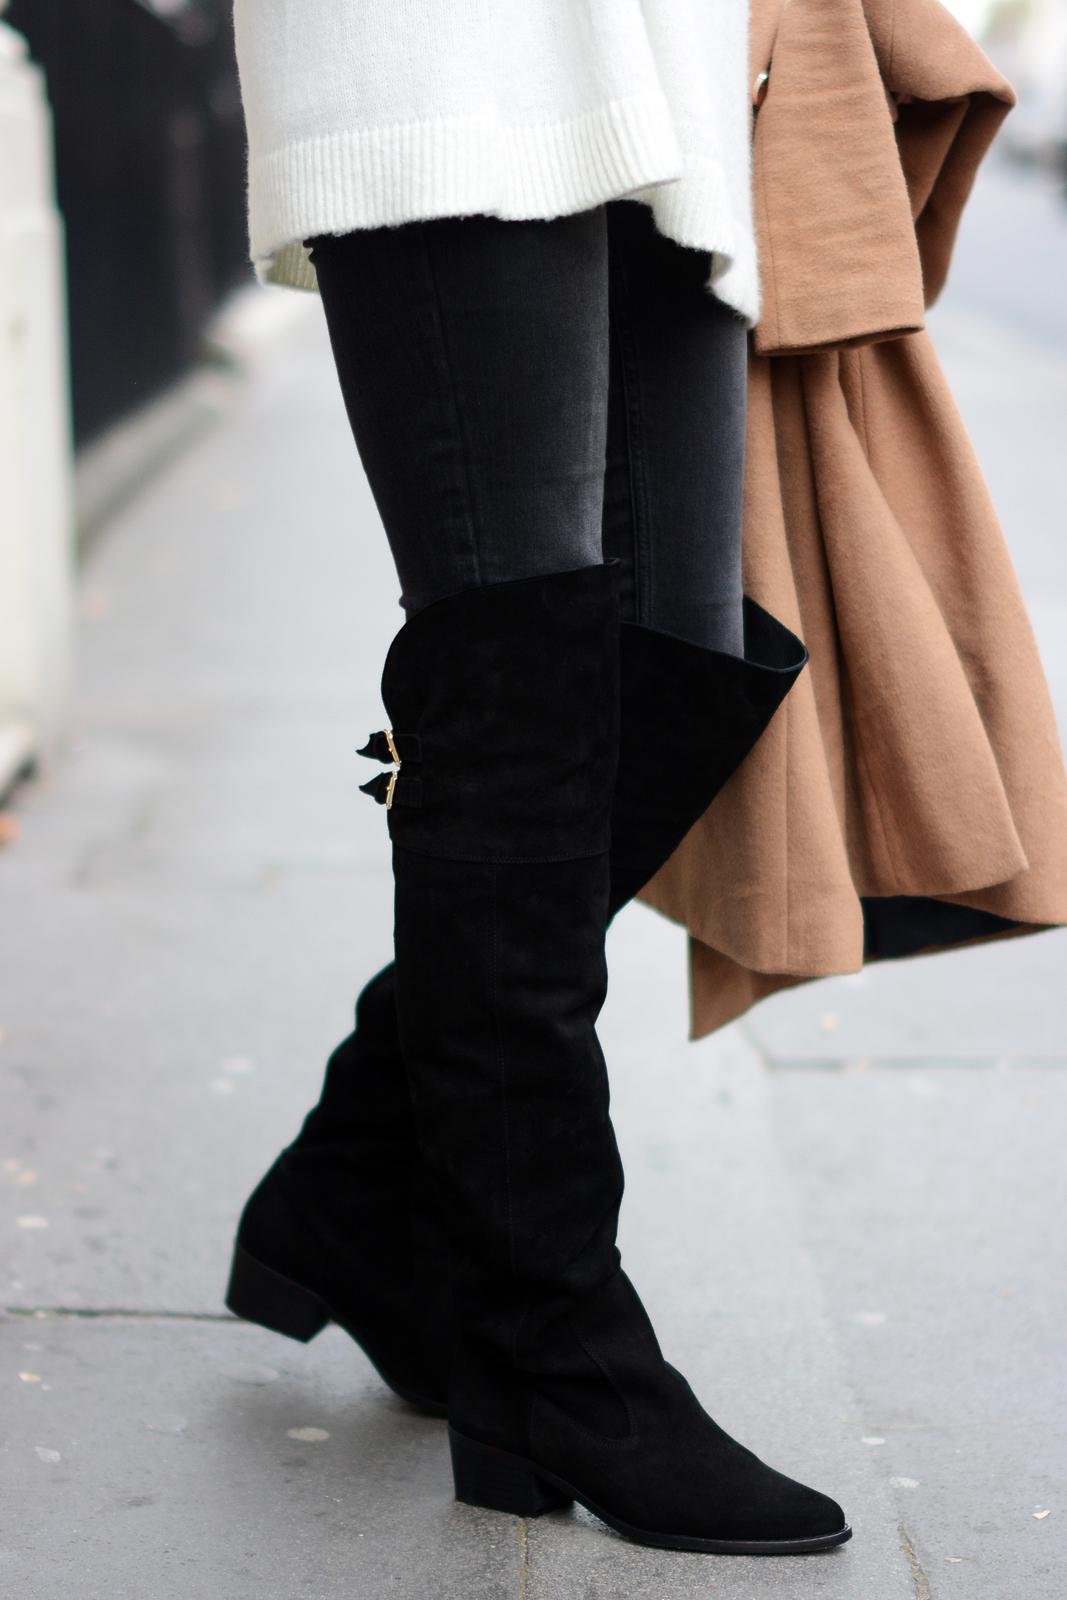 EJSTYLE - Schuh Spark OTK black suede flat boots